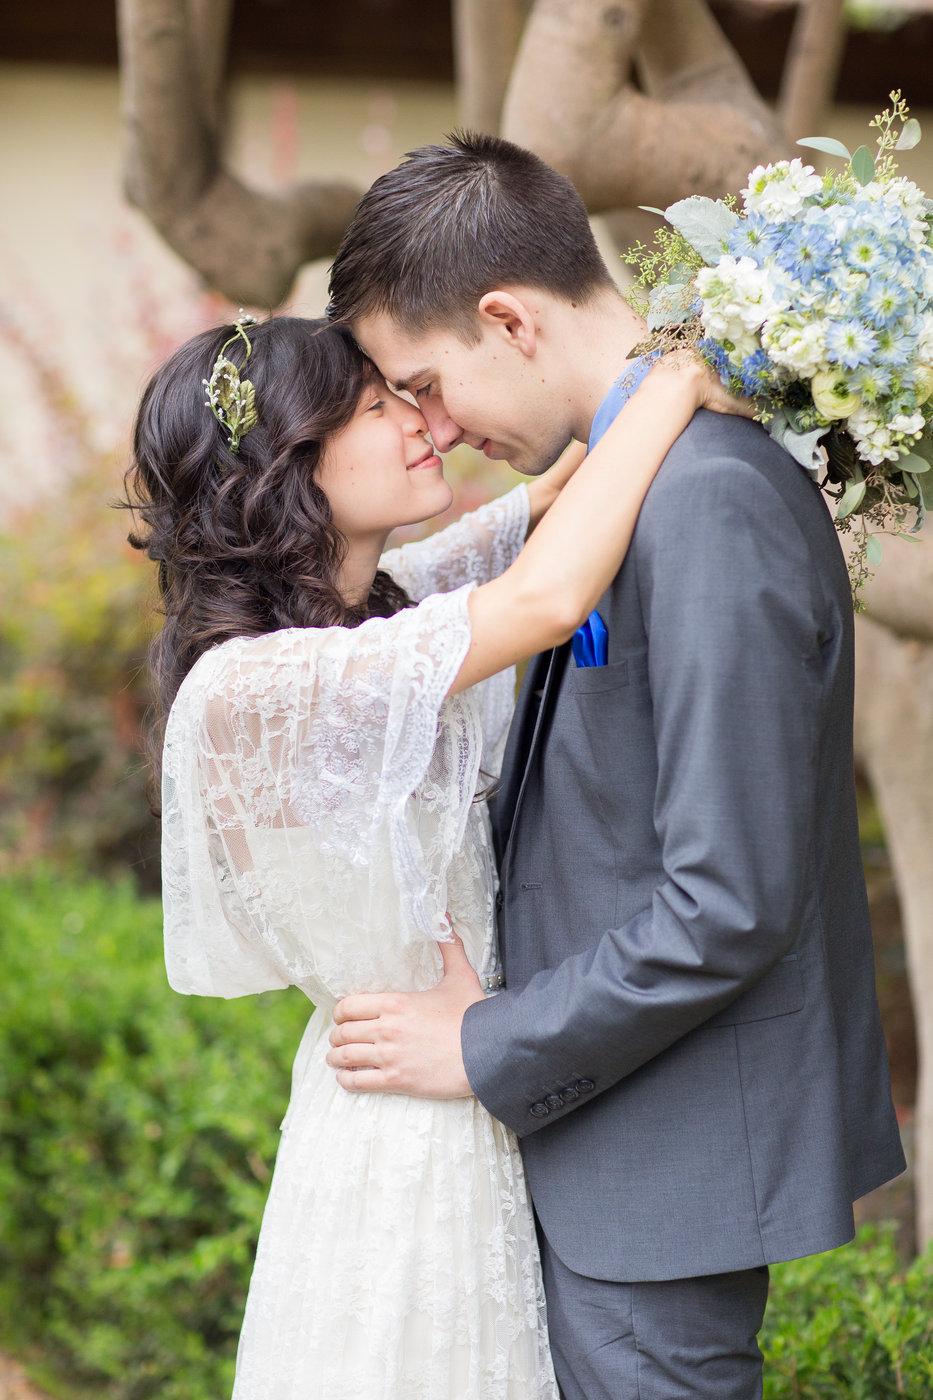 Shinn-Historic-Park-and-Arboretum-wedding-photographerj.jpg